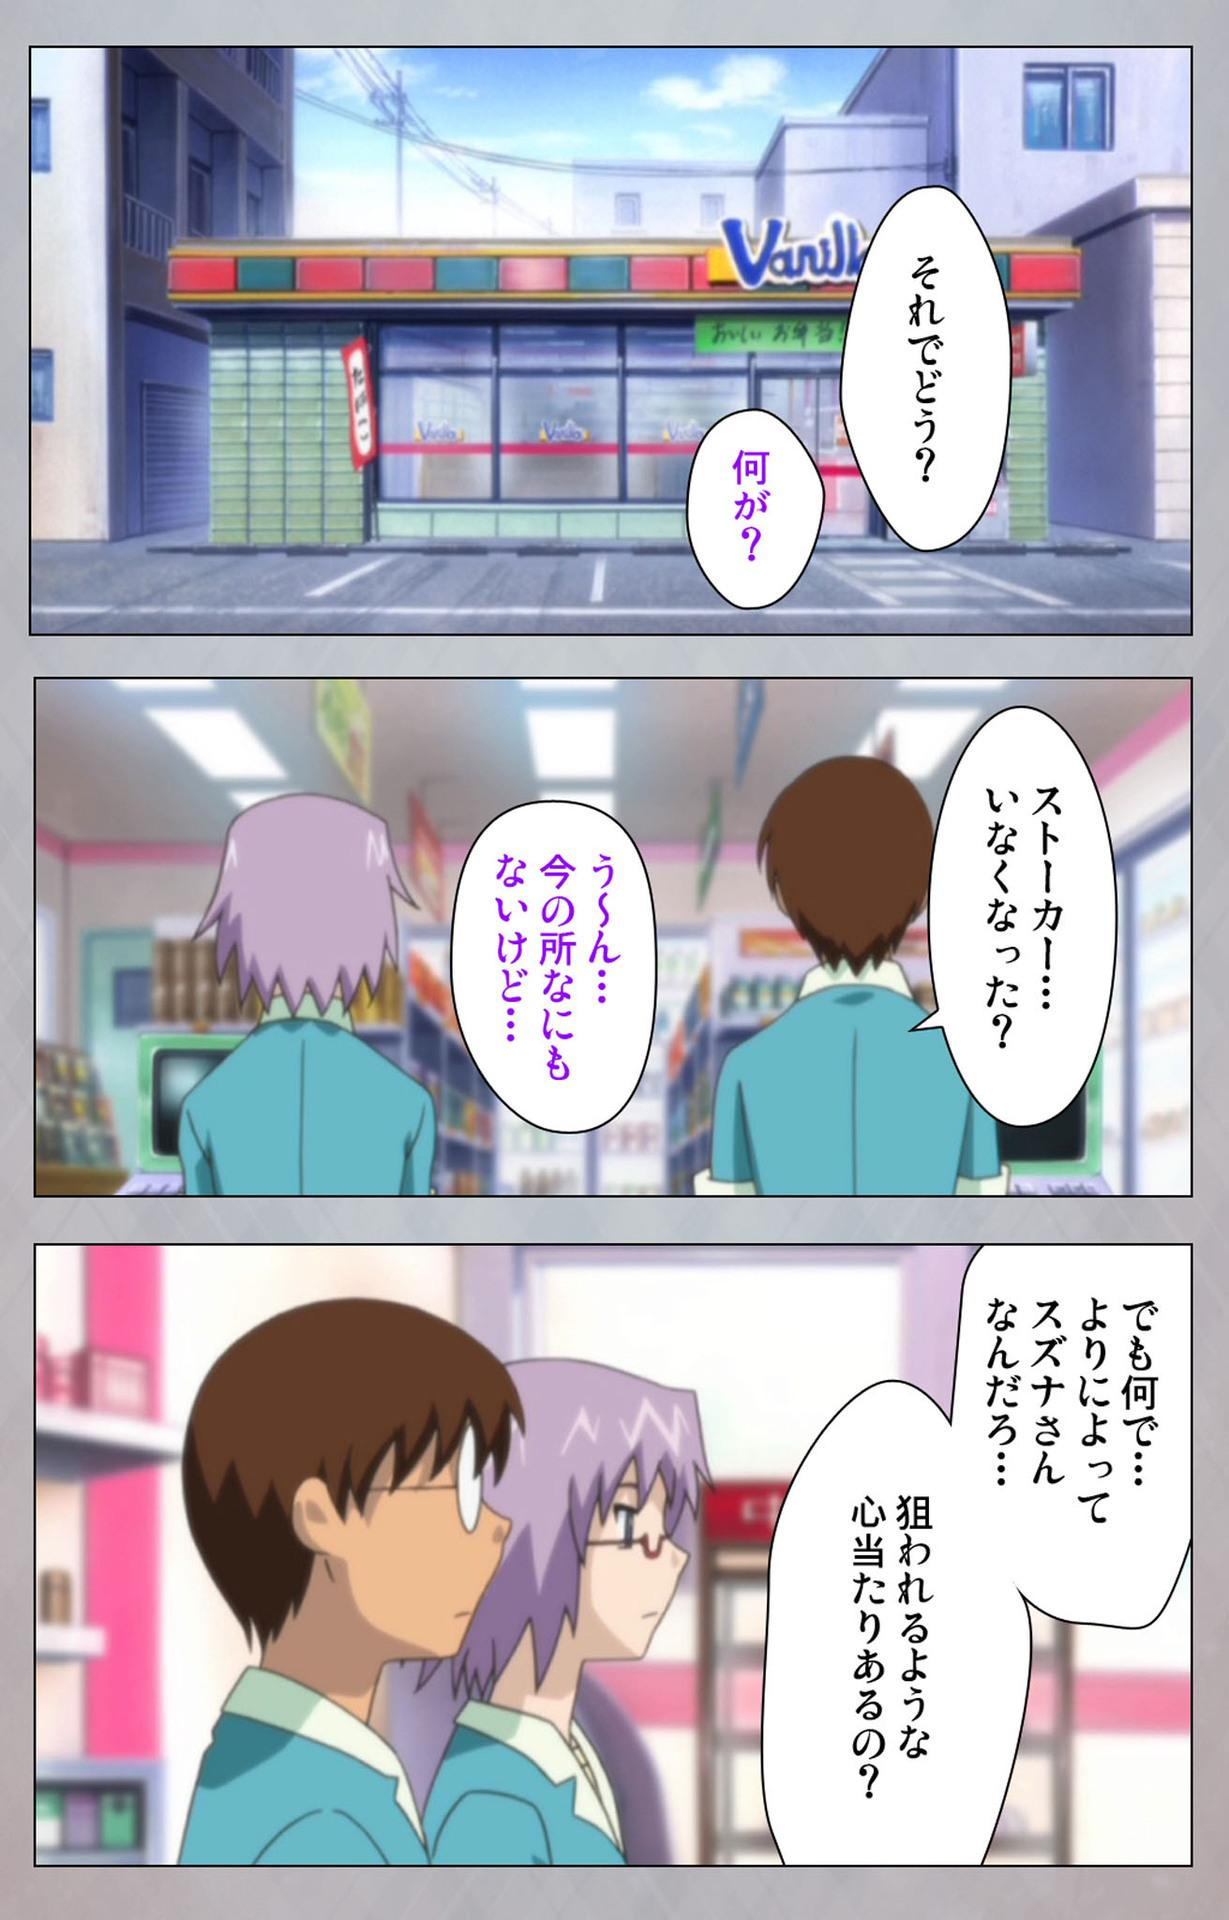 [Digital Works] [Full Color Seijin Ban] Sex Android ~Risou no Onna de Nuite yaru~ Kanzenban 58